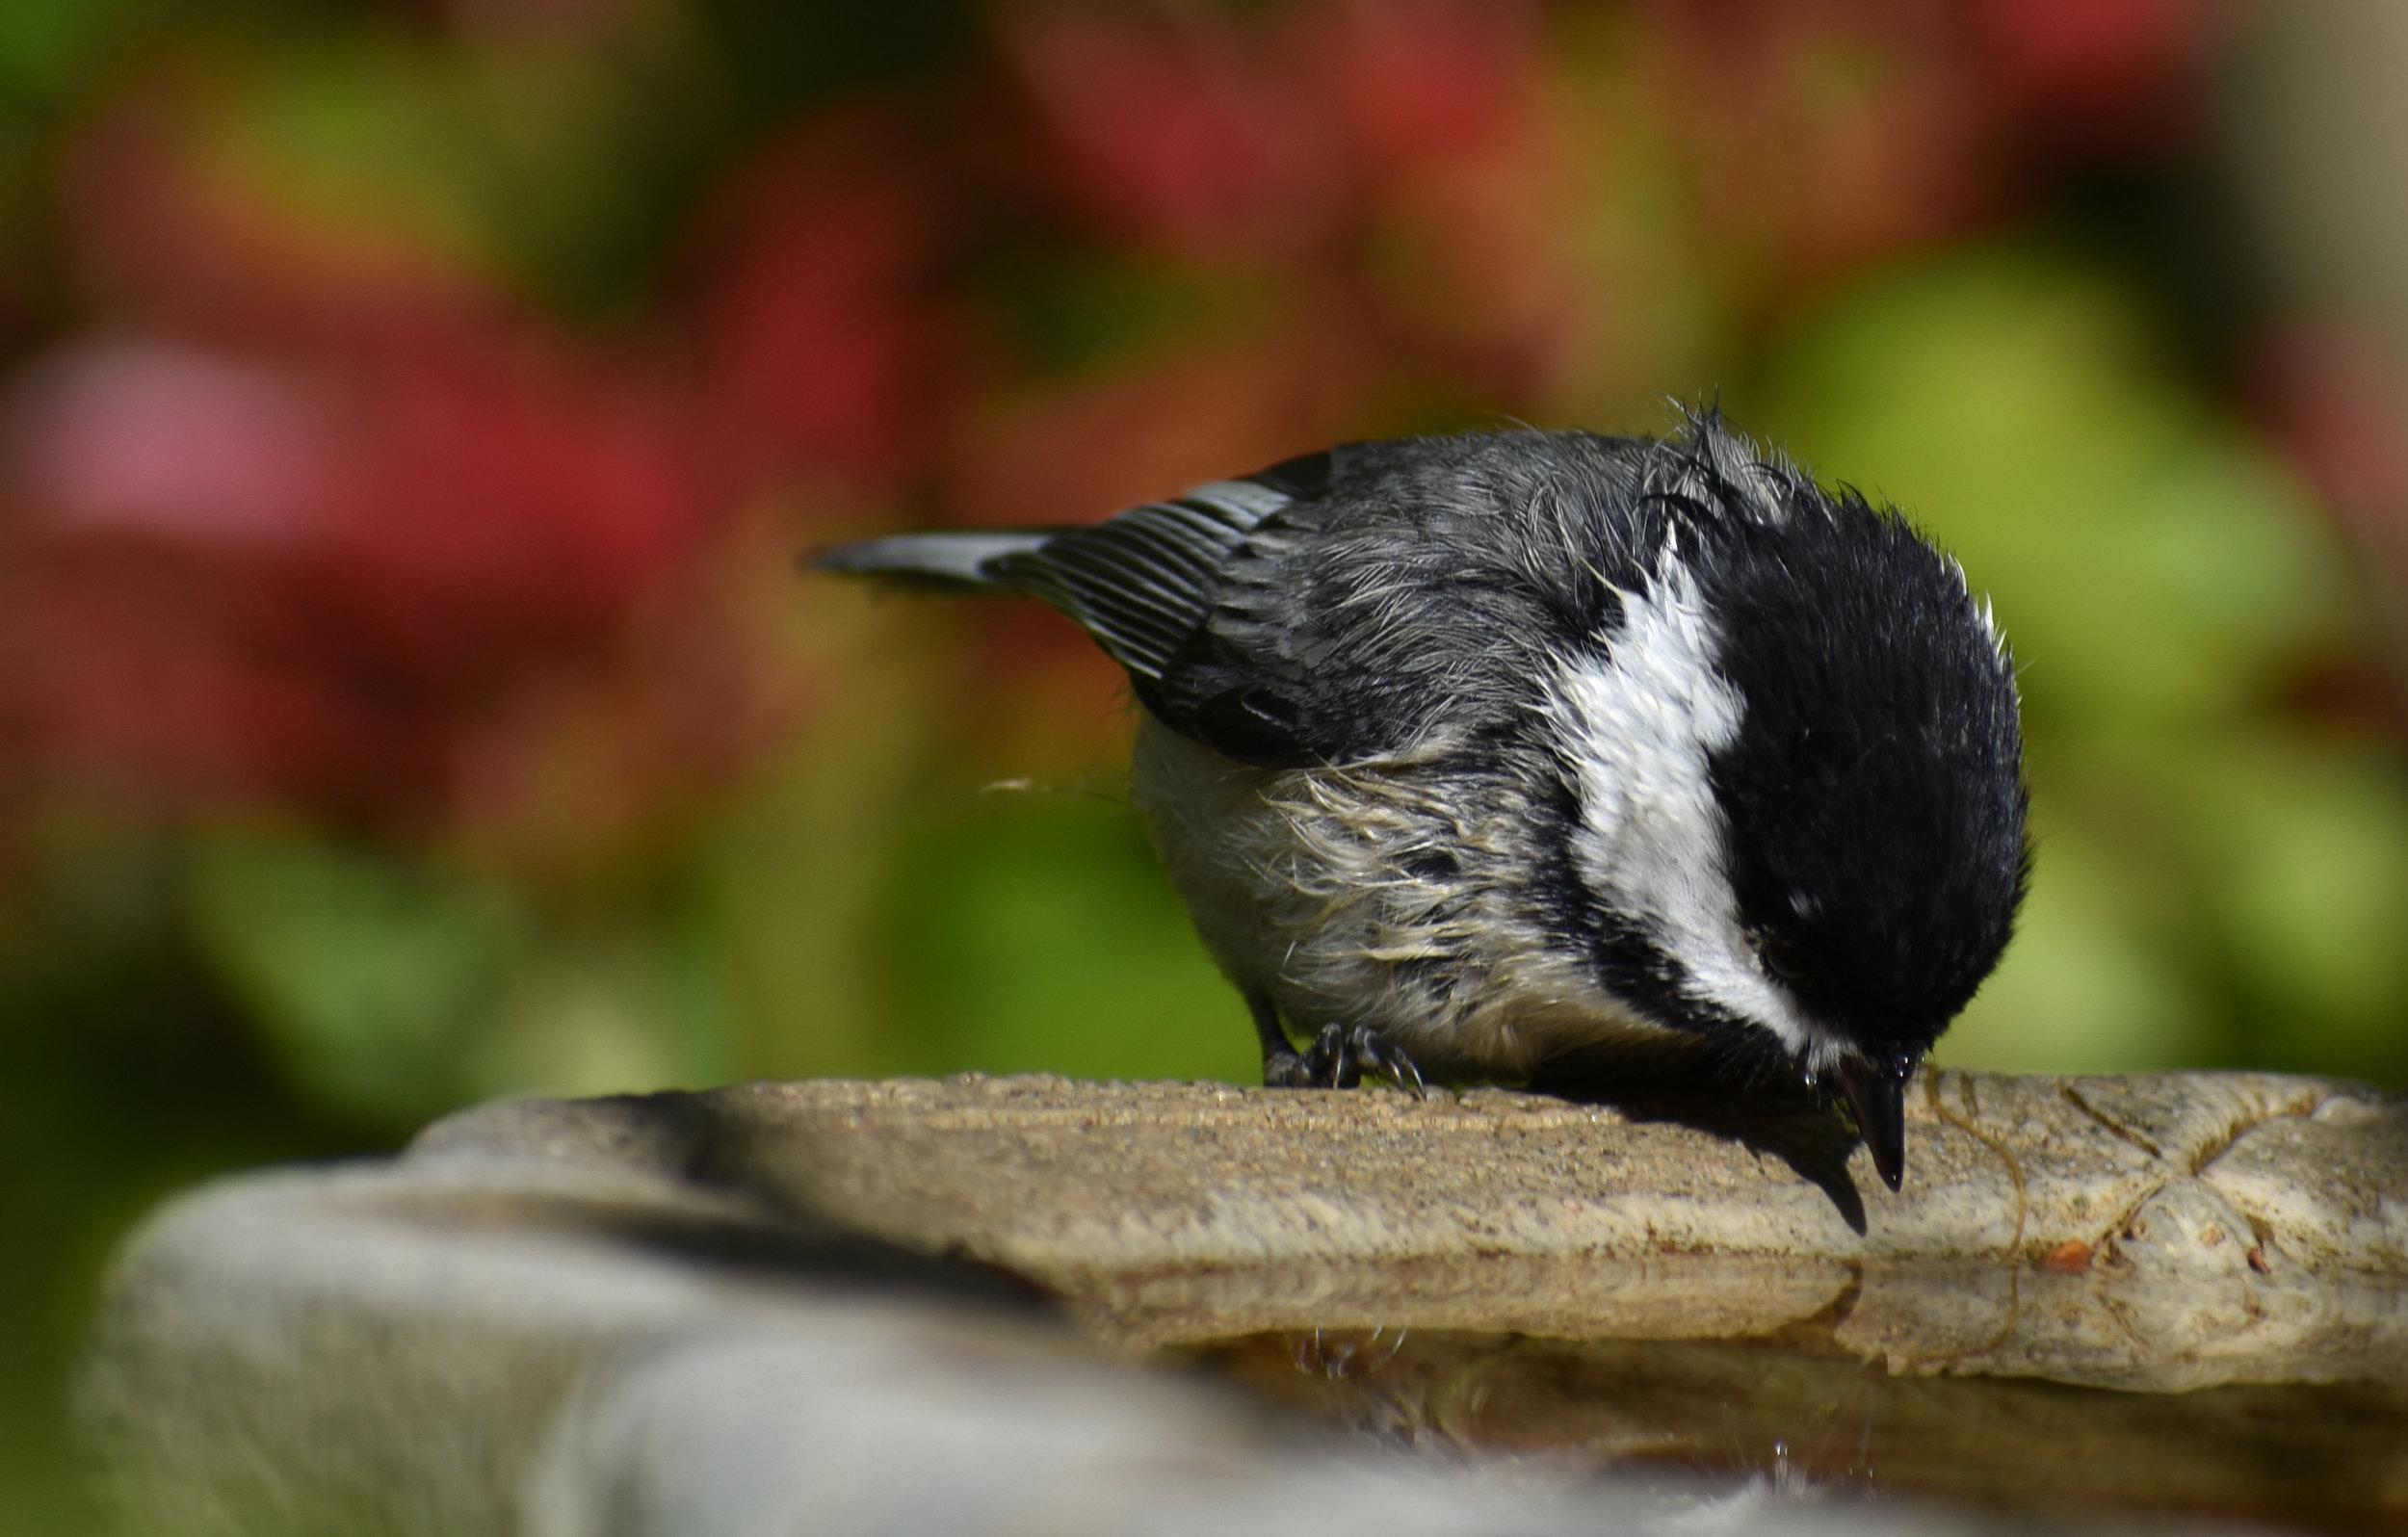 Black-Capped Chickadee drinking from birdbath